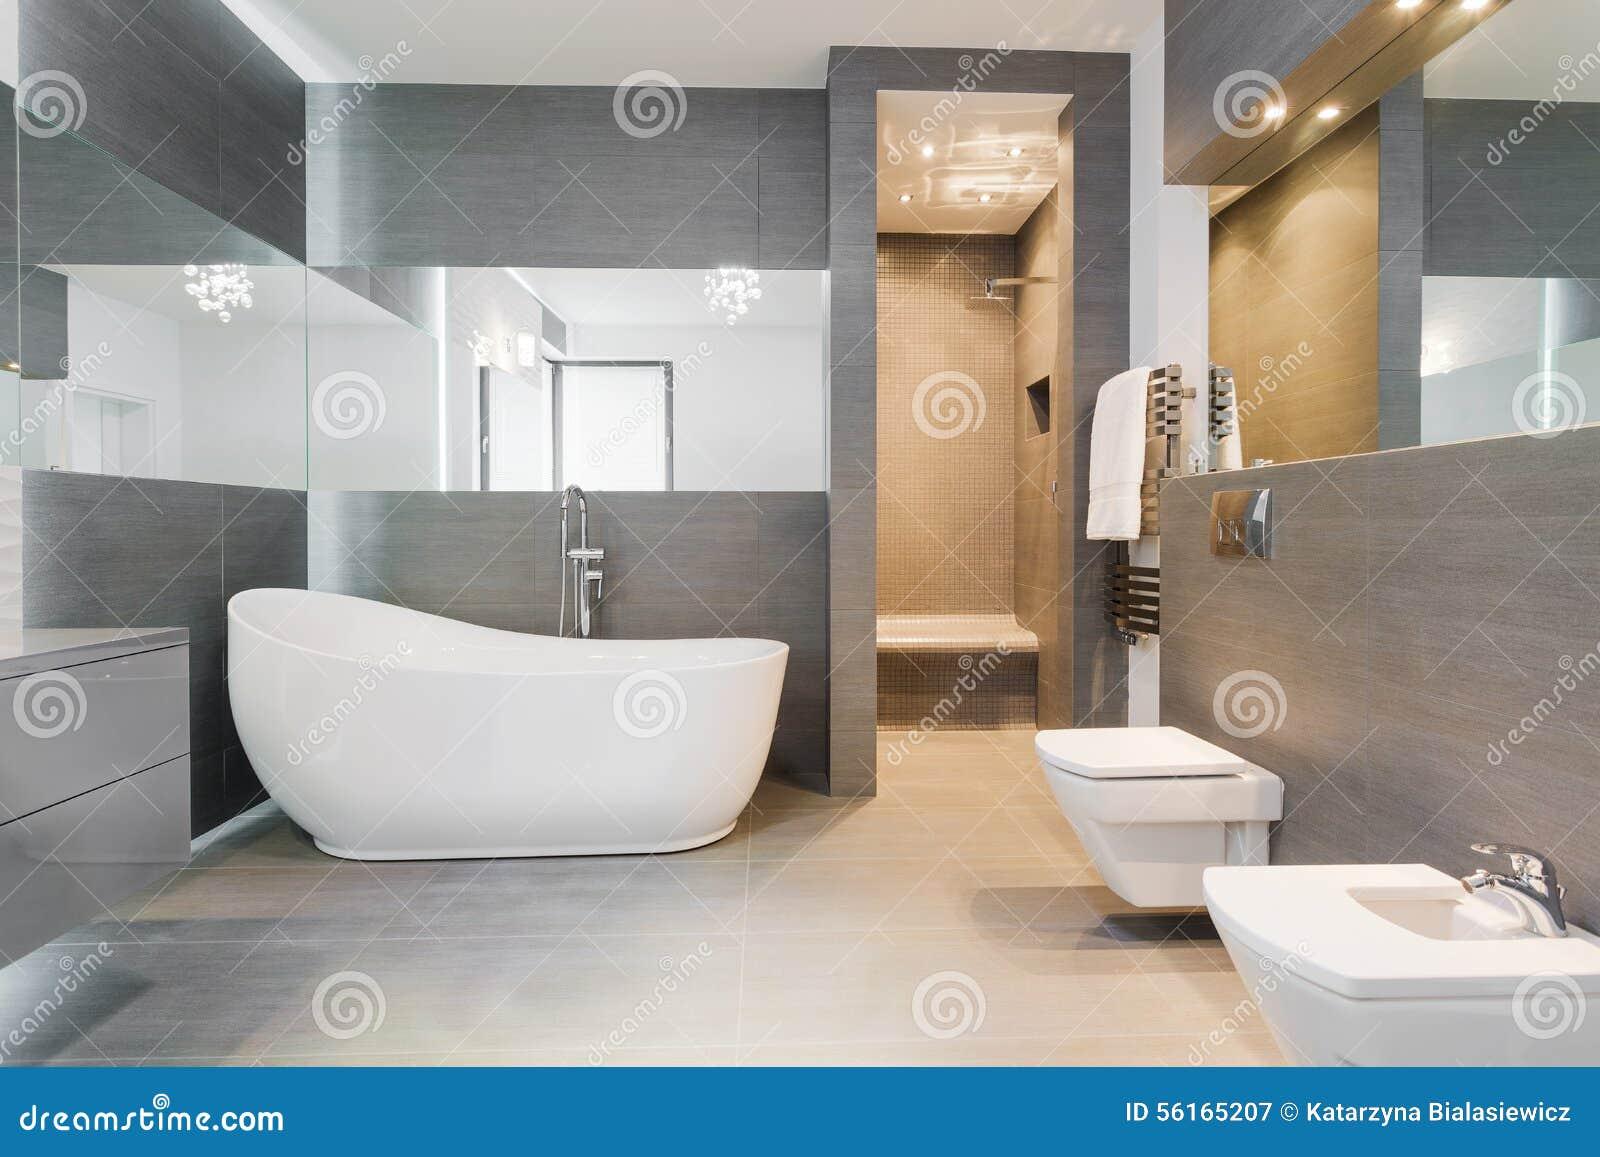 Freestanding Bath In Modern Bathroom Royalty Free Stock Photography